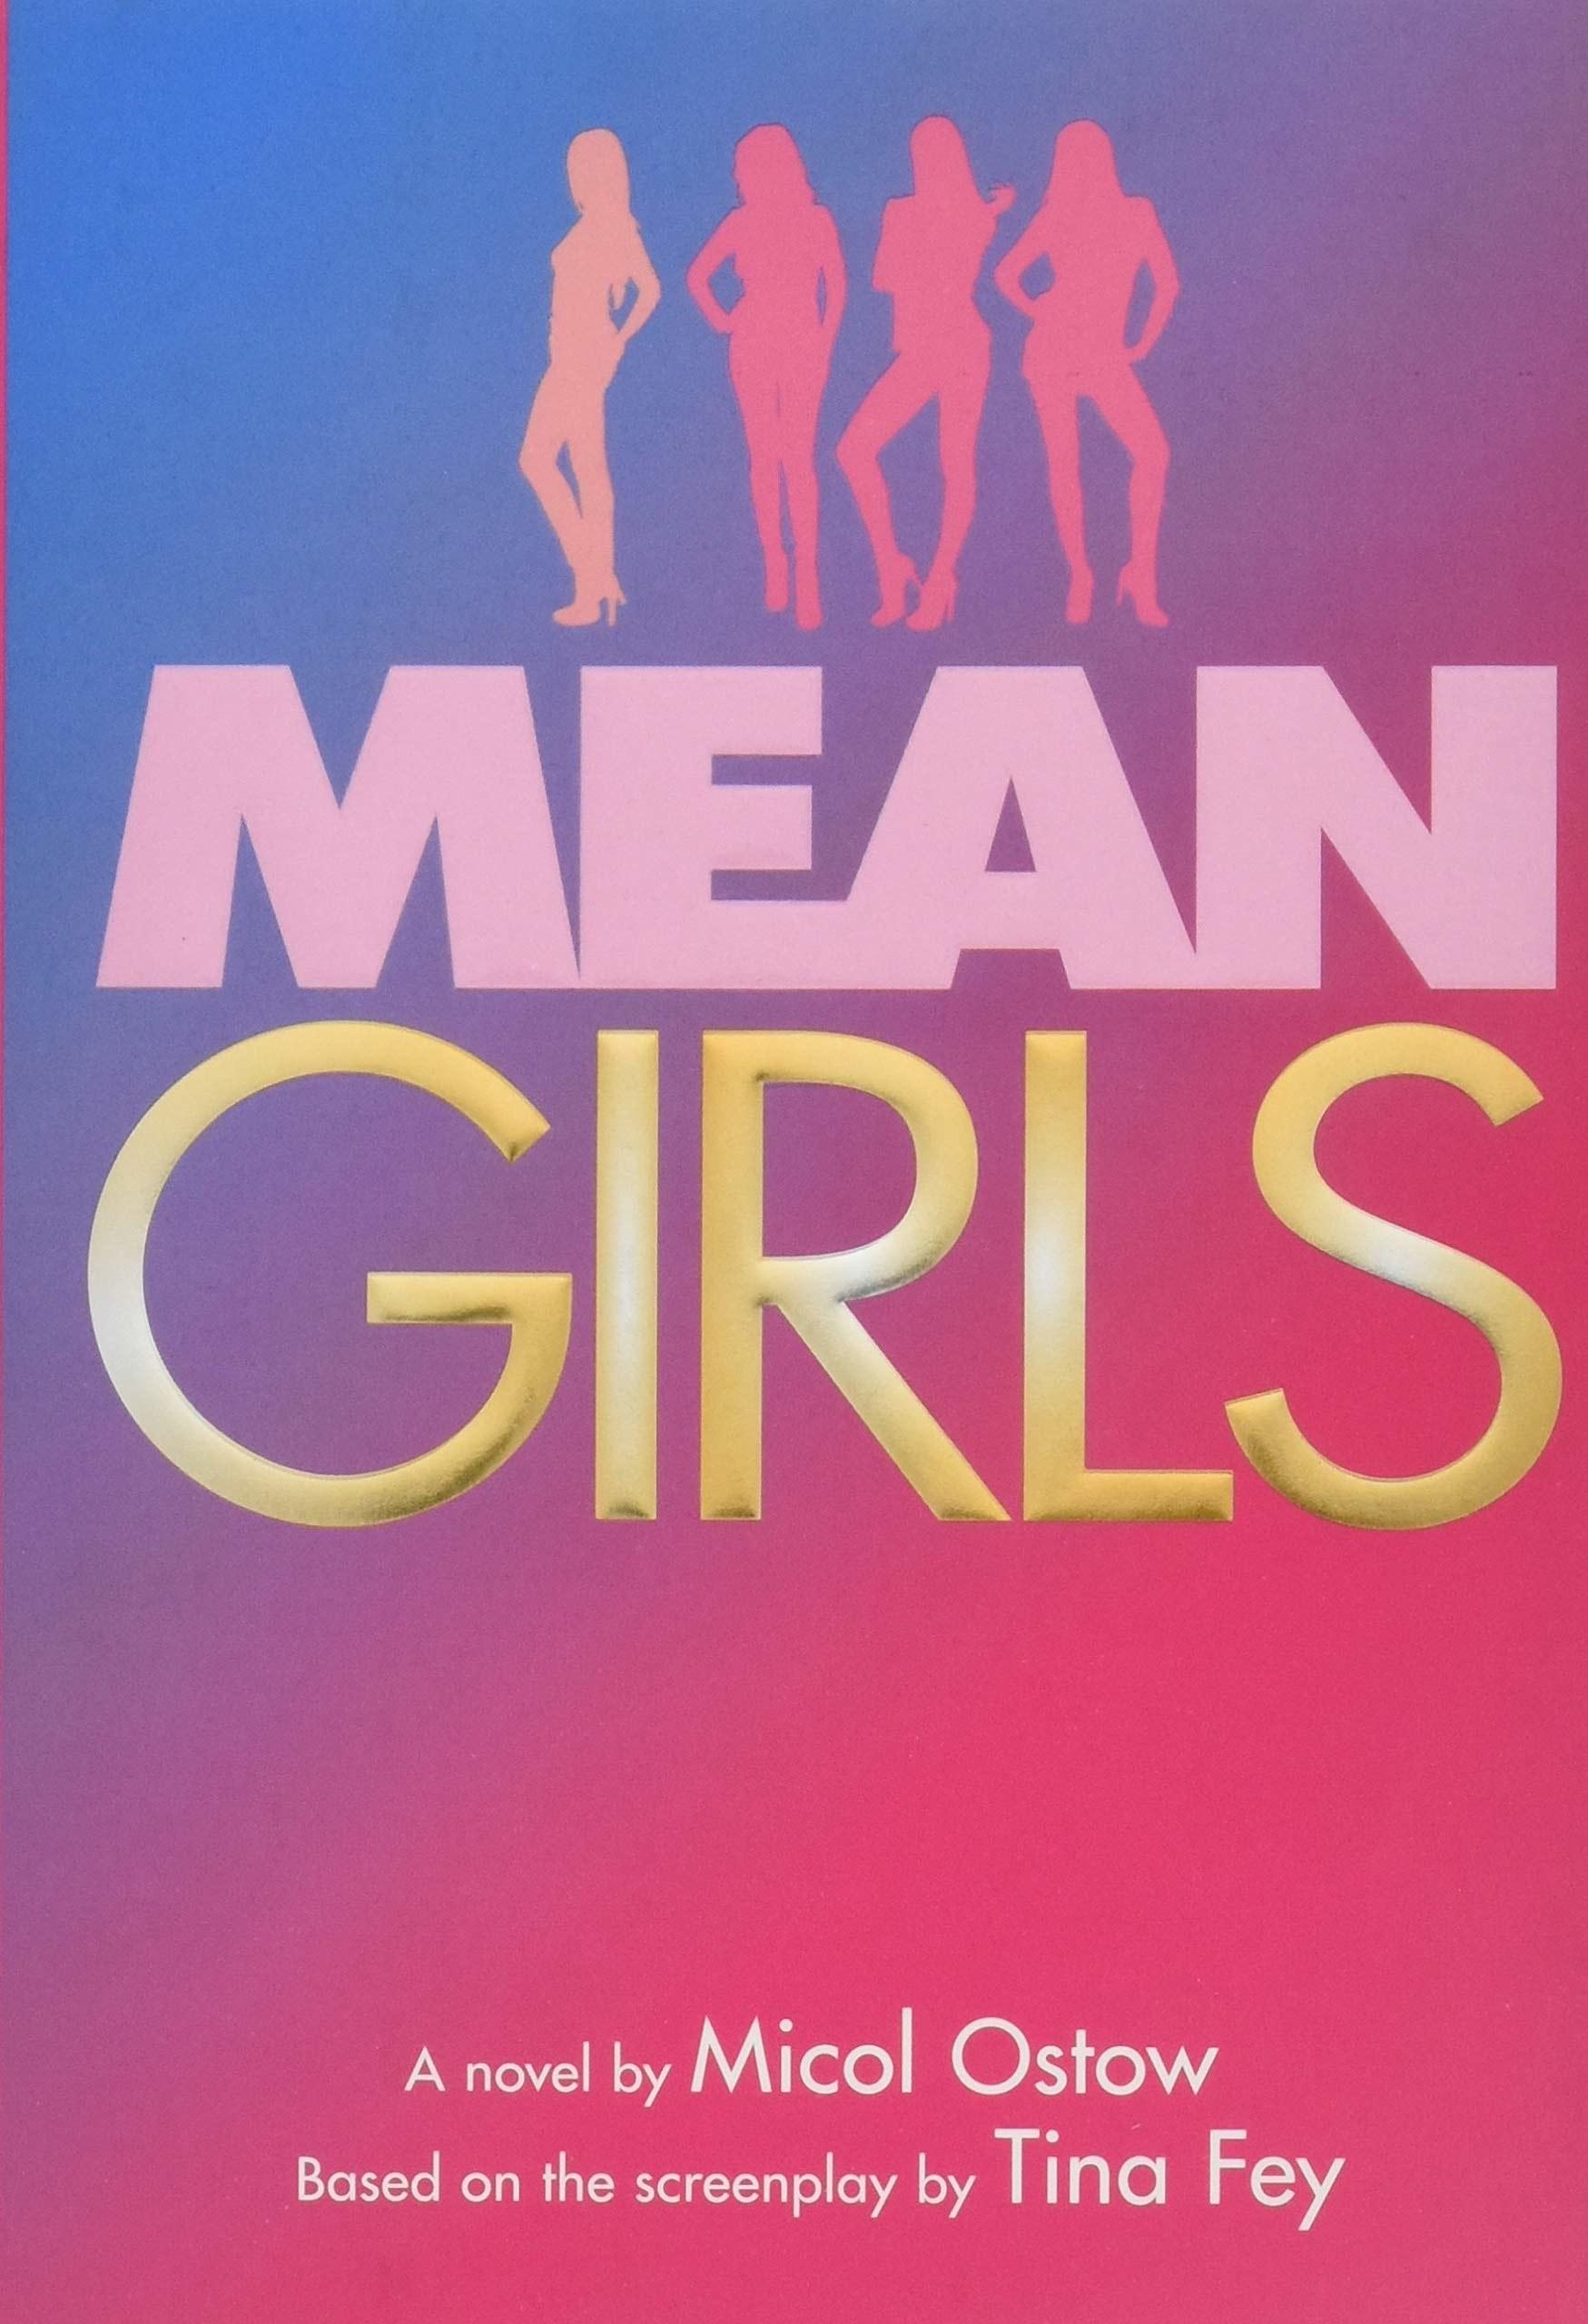 A book called Mean Girls